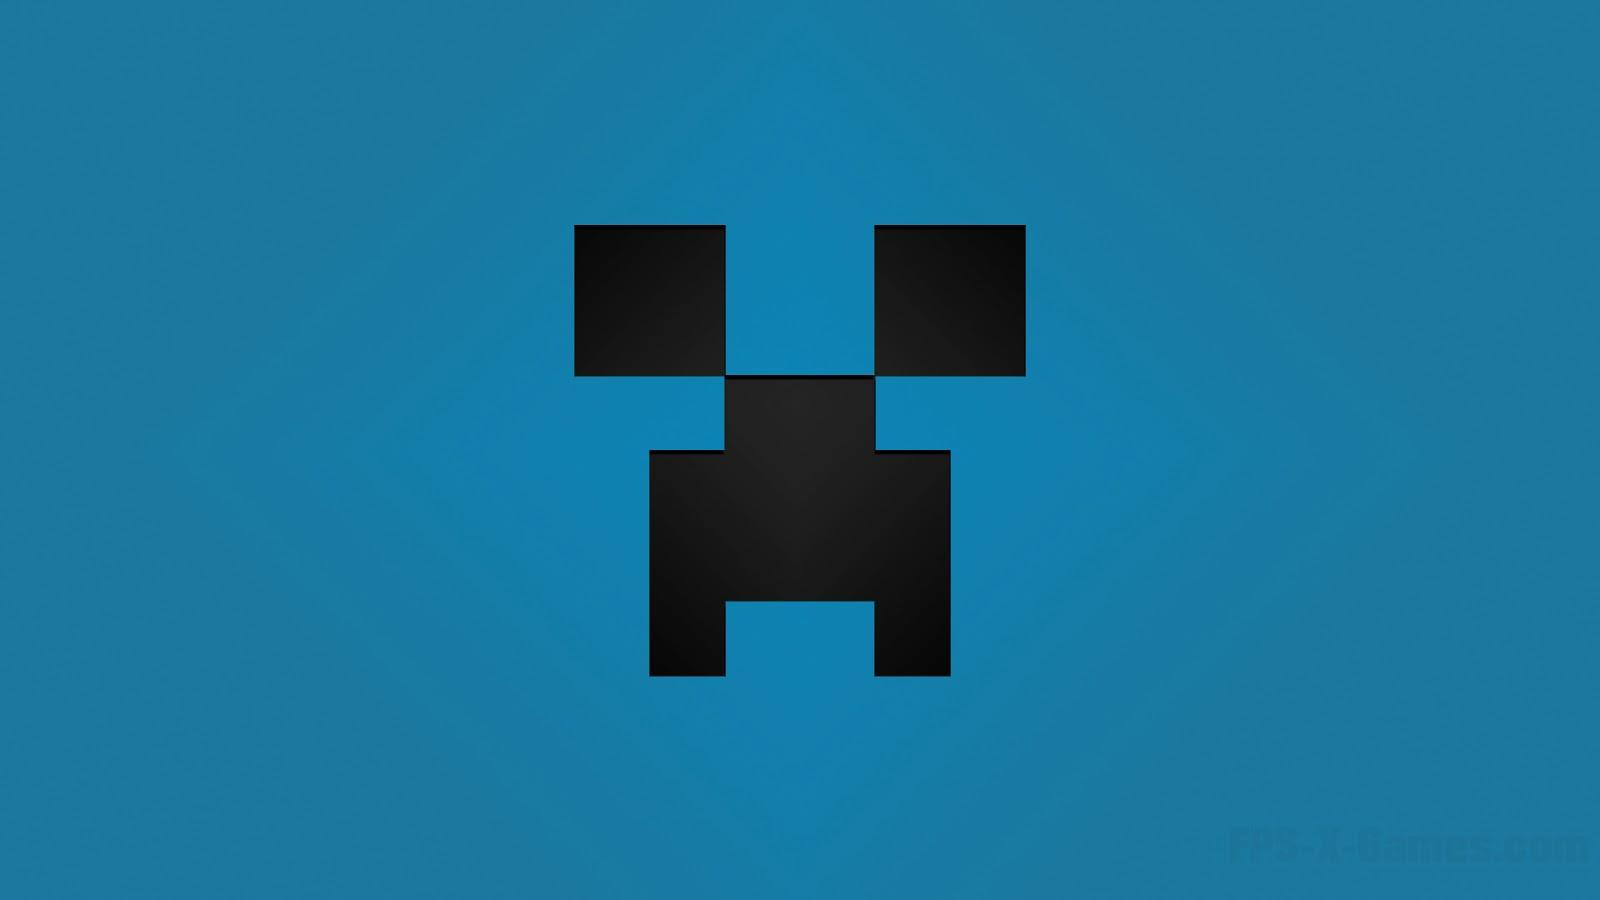 39+] Minecraft Blue Creeper Wallpaper